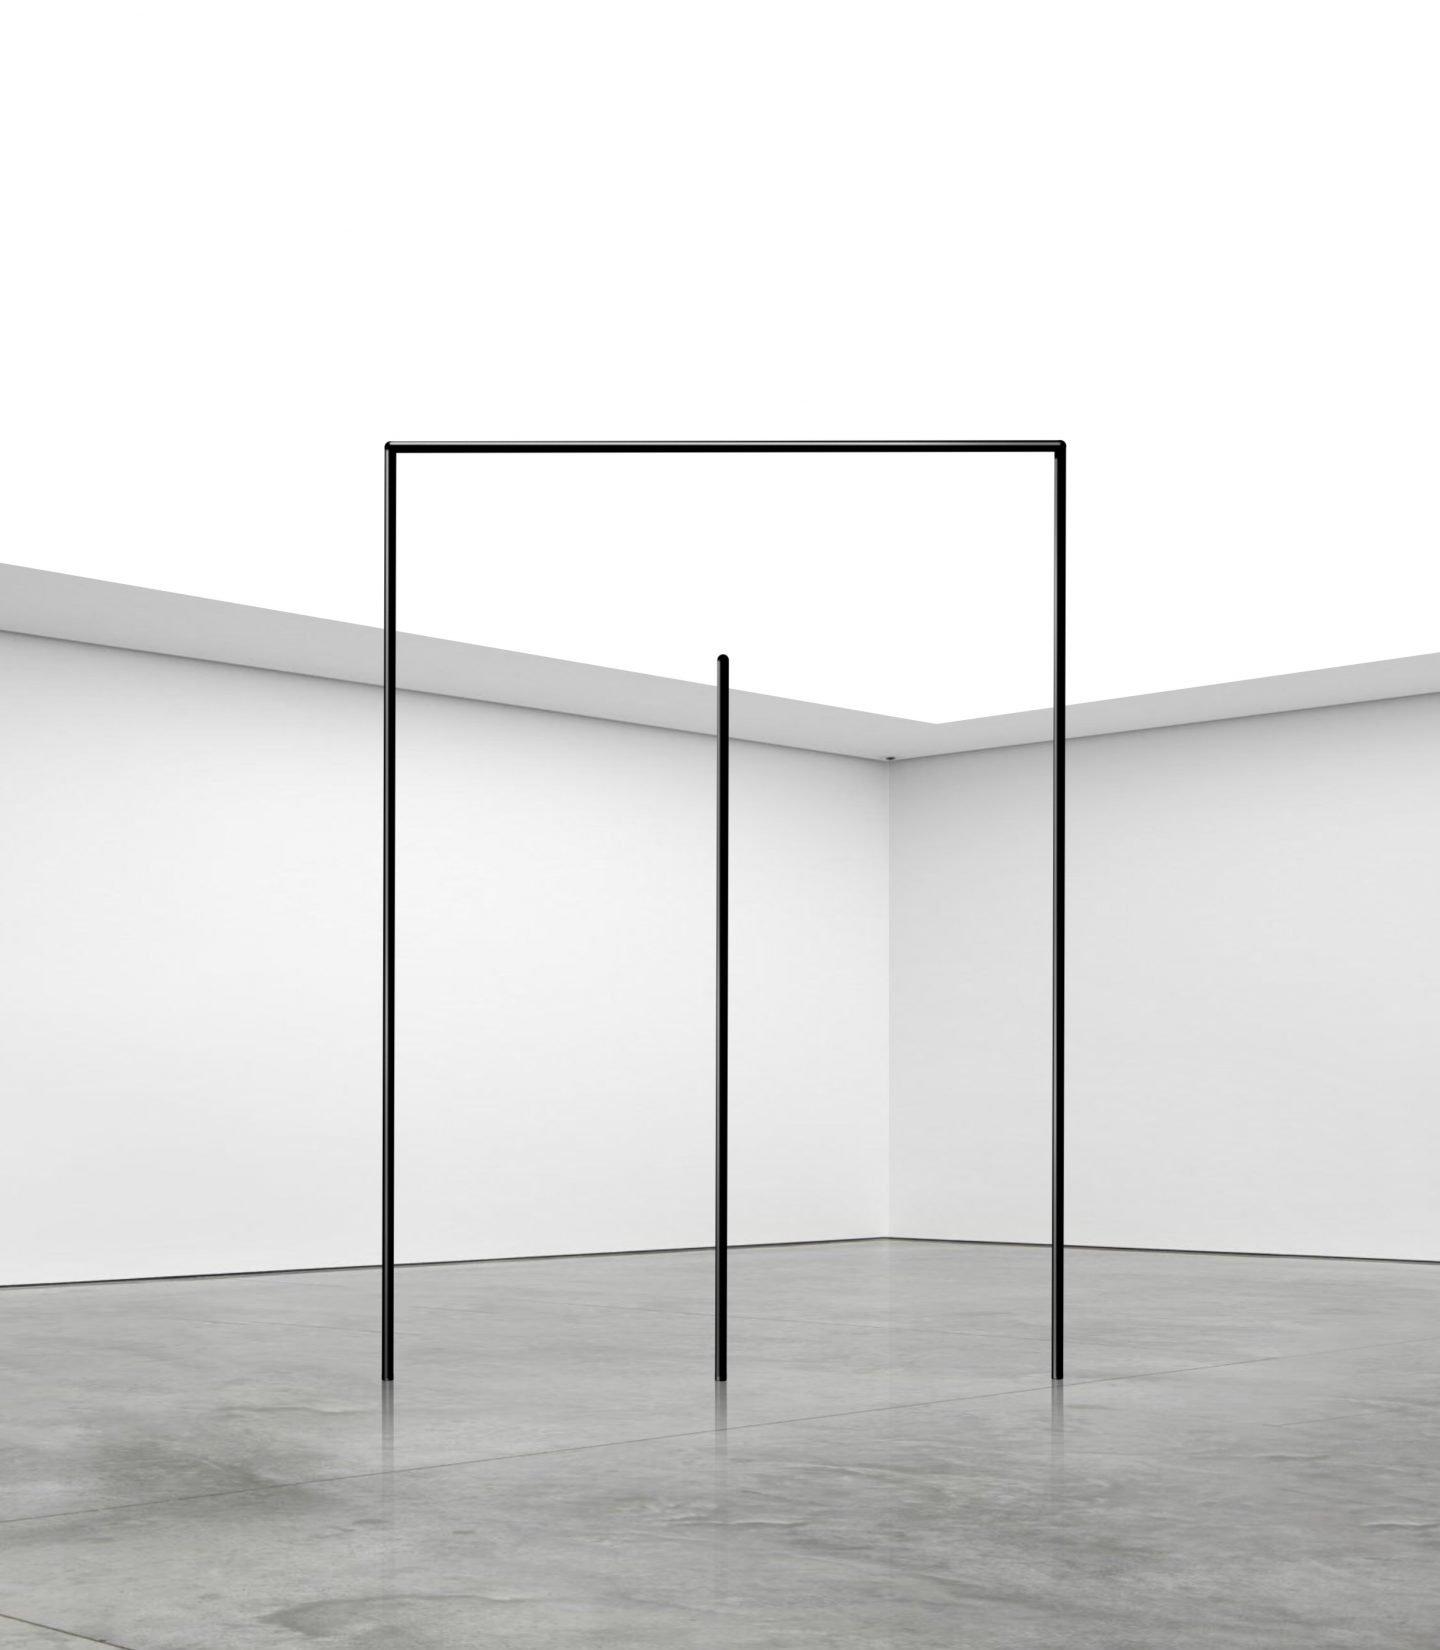 IGNANT-Art-Mikael-Strobek-03